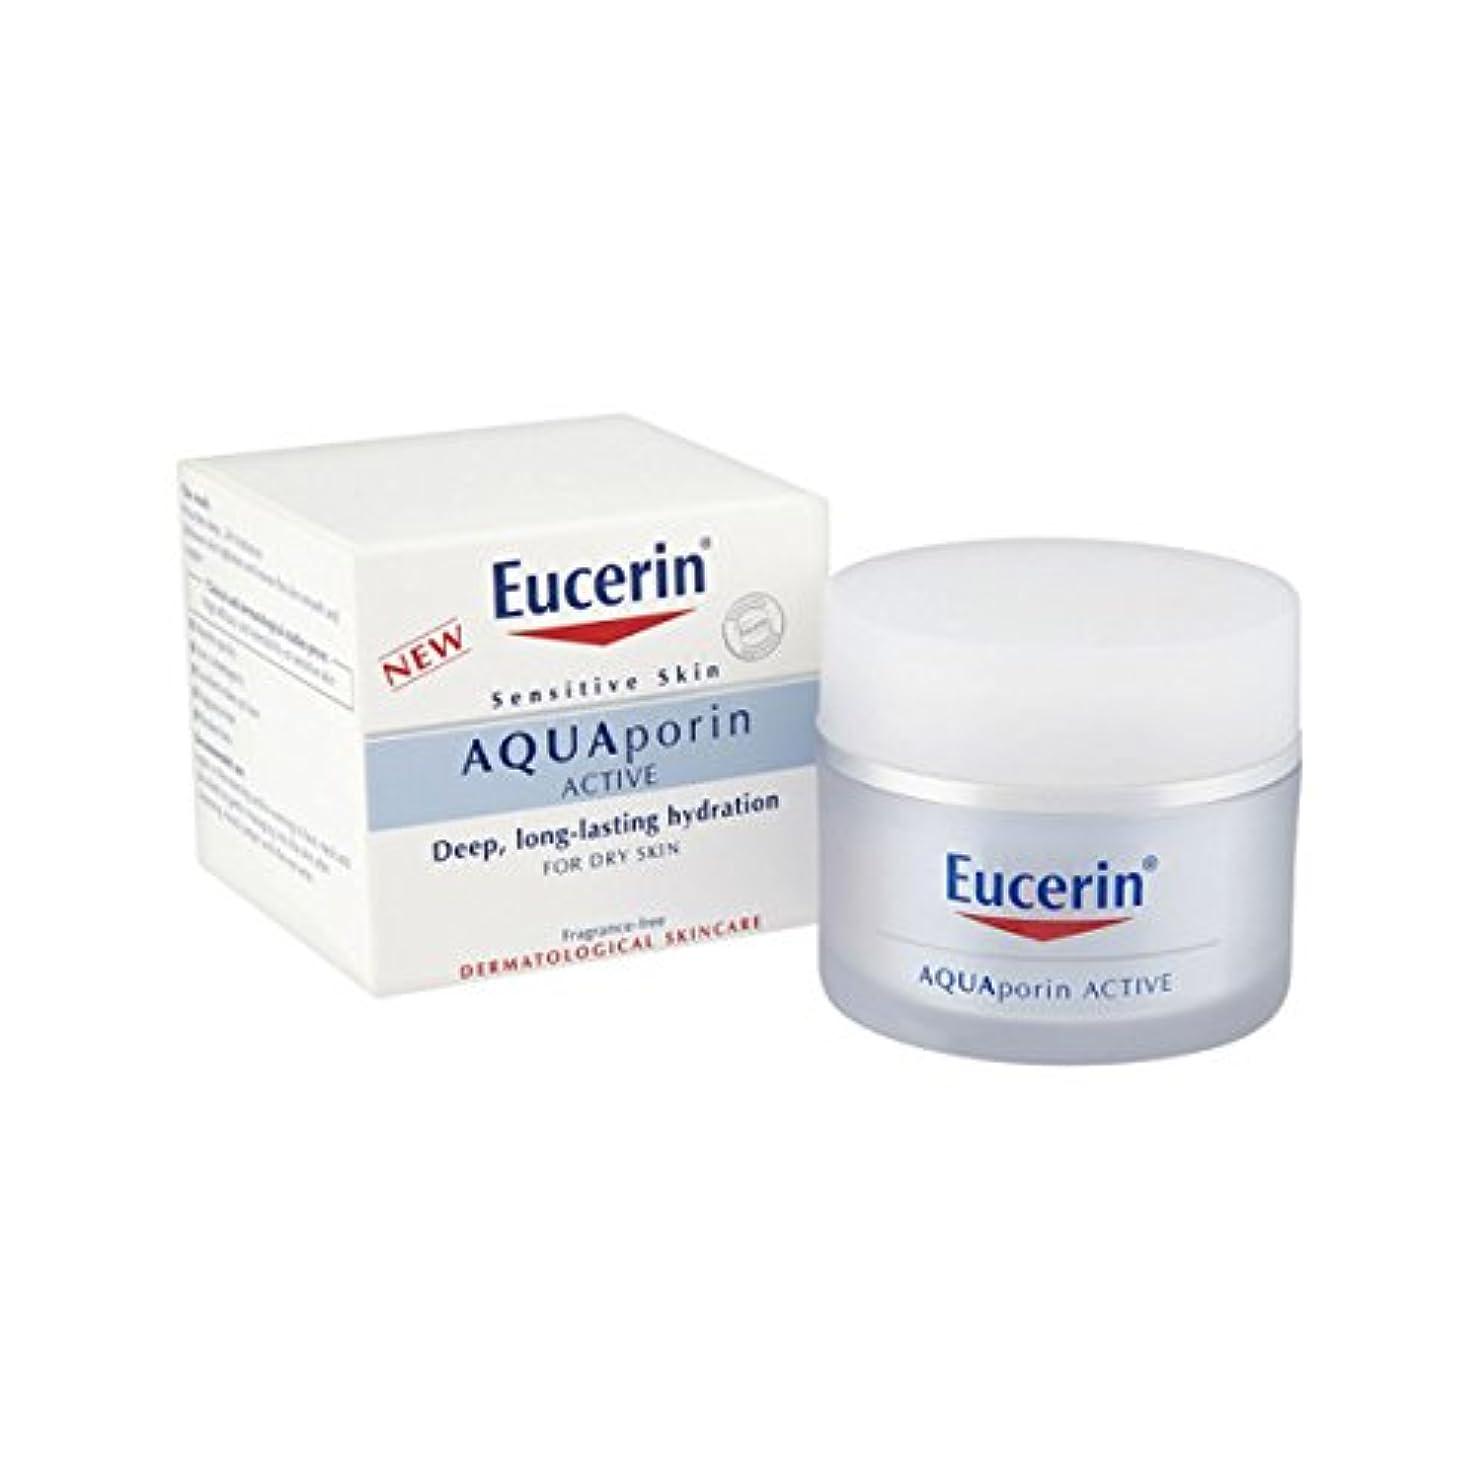 修士号知覚的花弁Eucerin Aquaporin Active Dry Skin 50ml [並行輸入品]